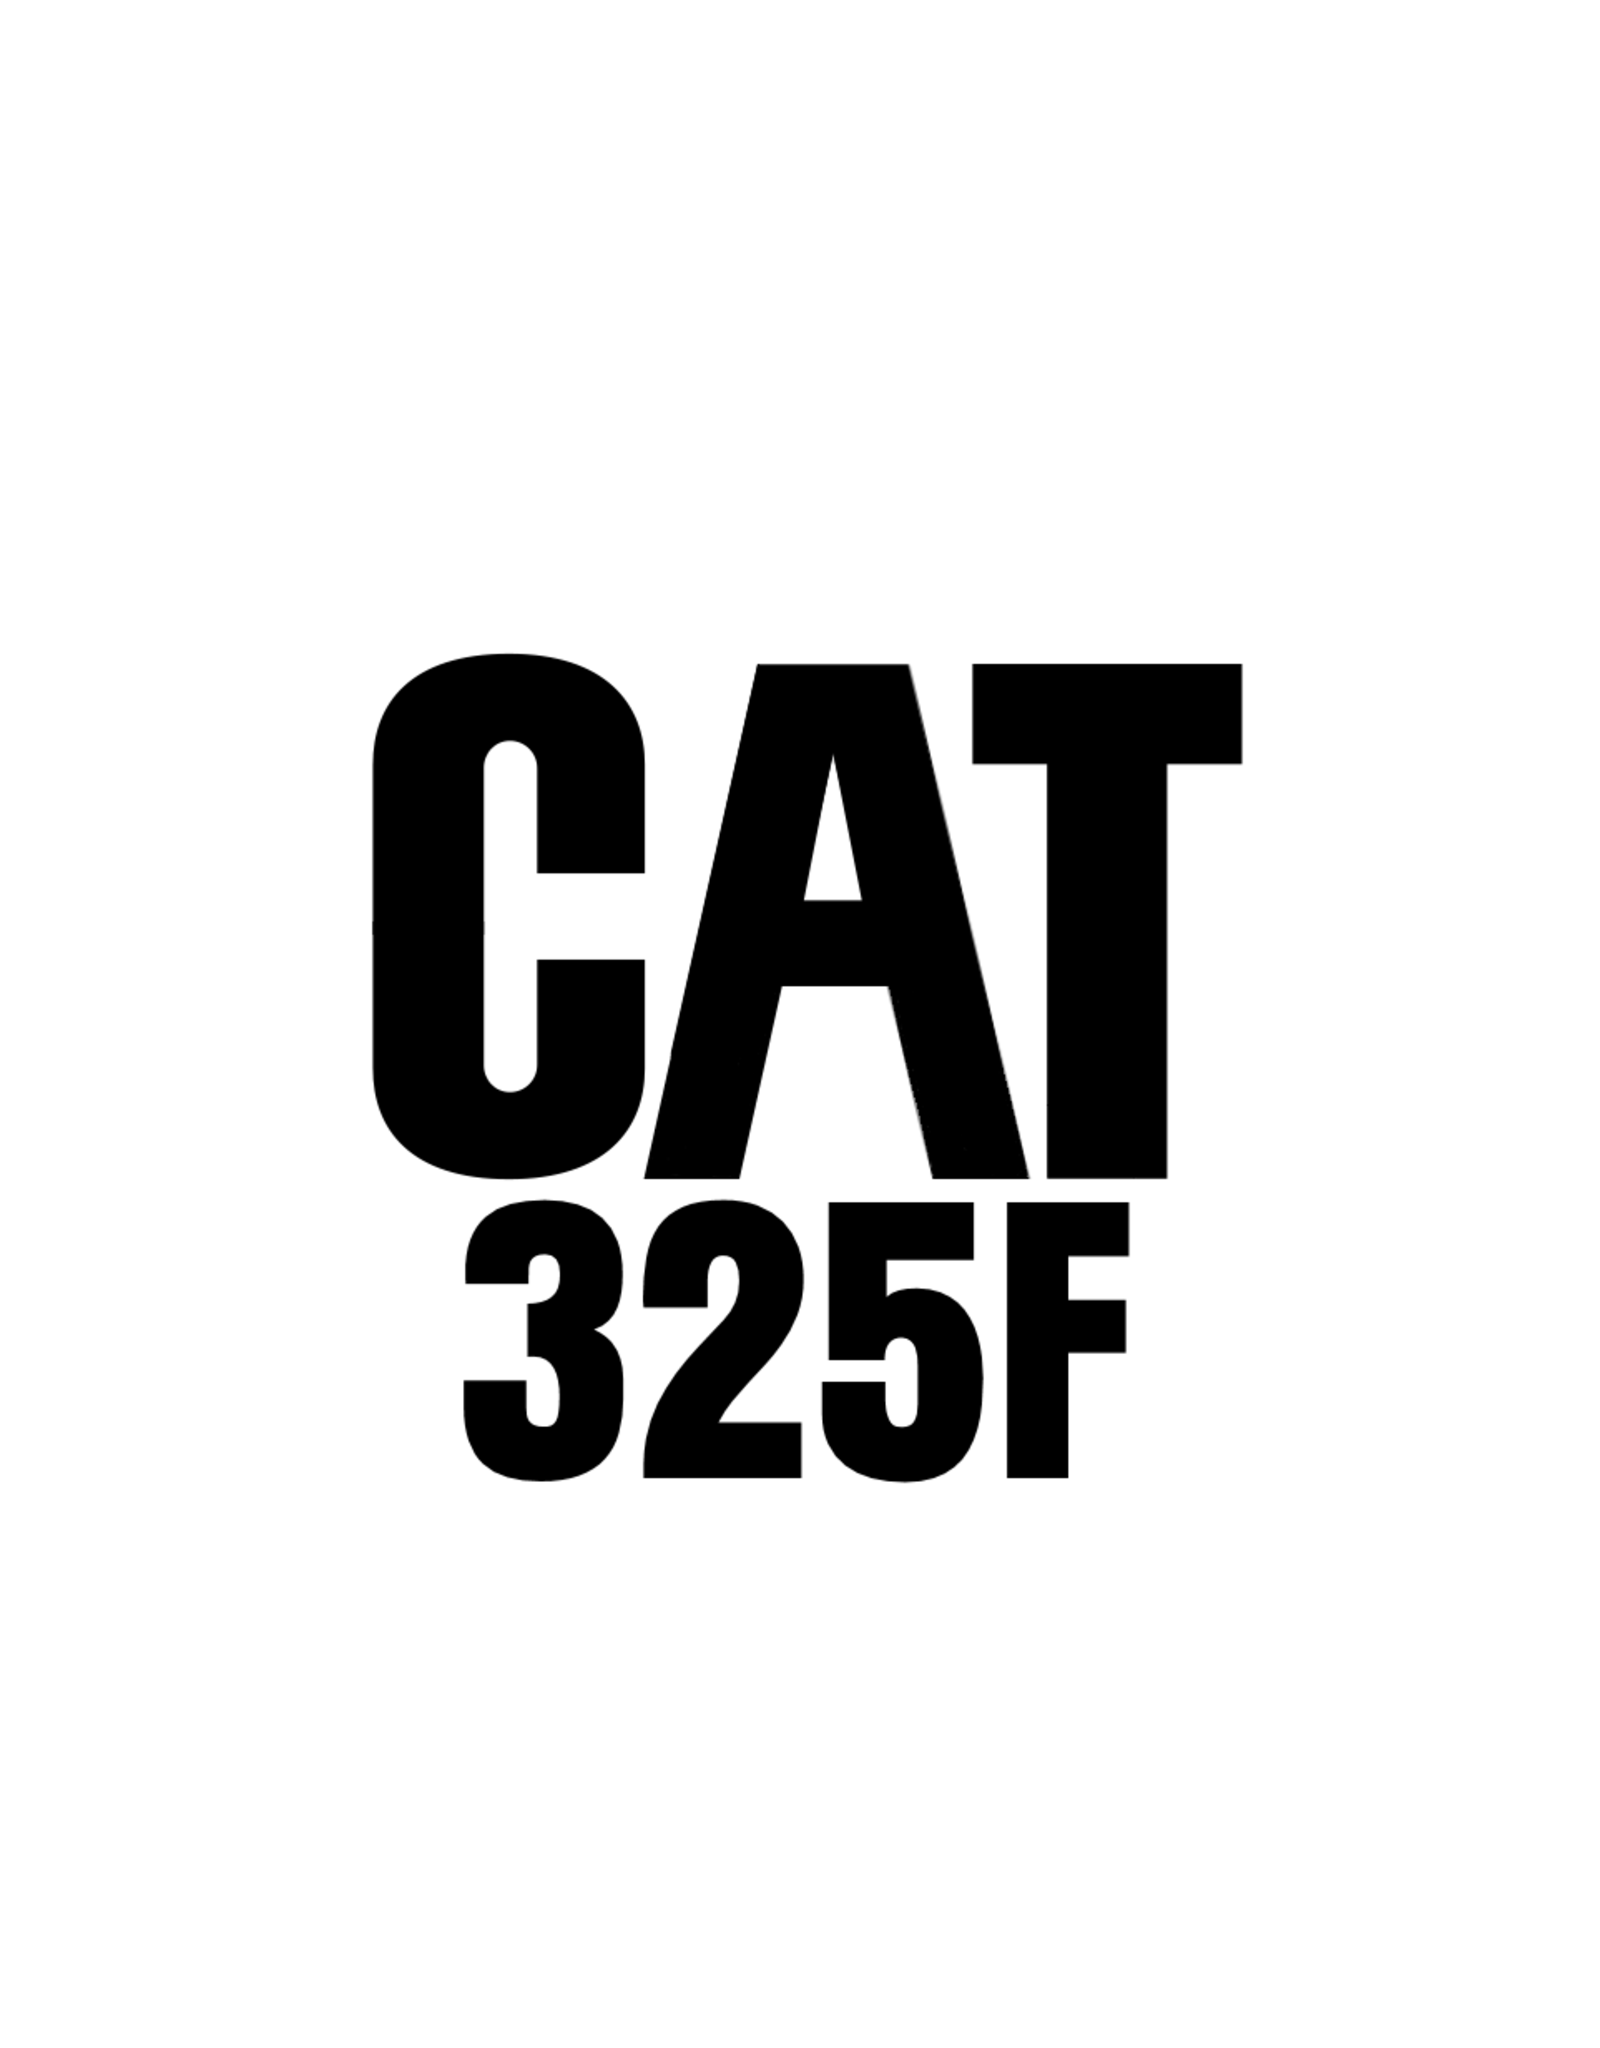 Echle Hartstahl GmbH FOPS for CAT 325F